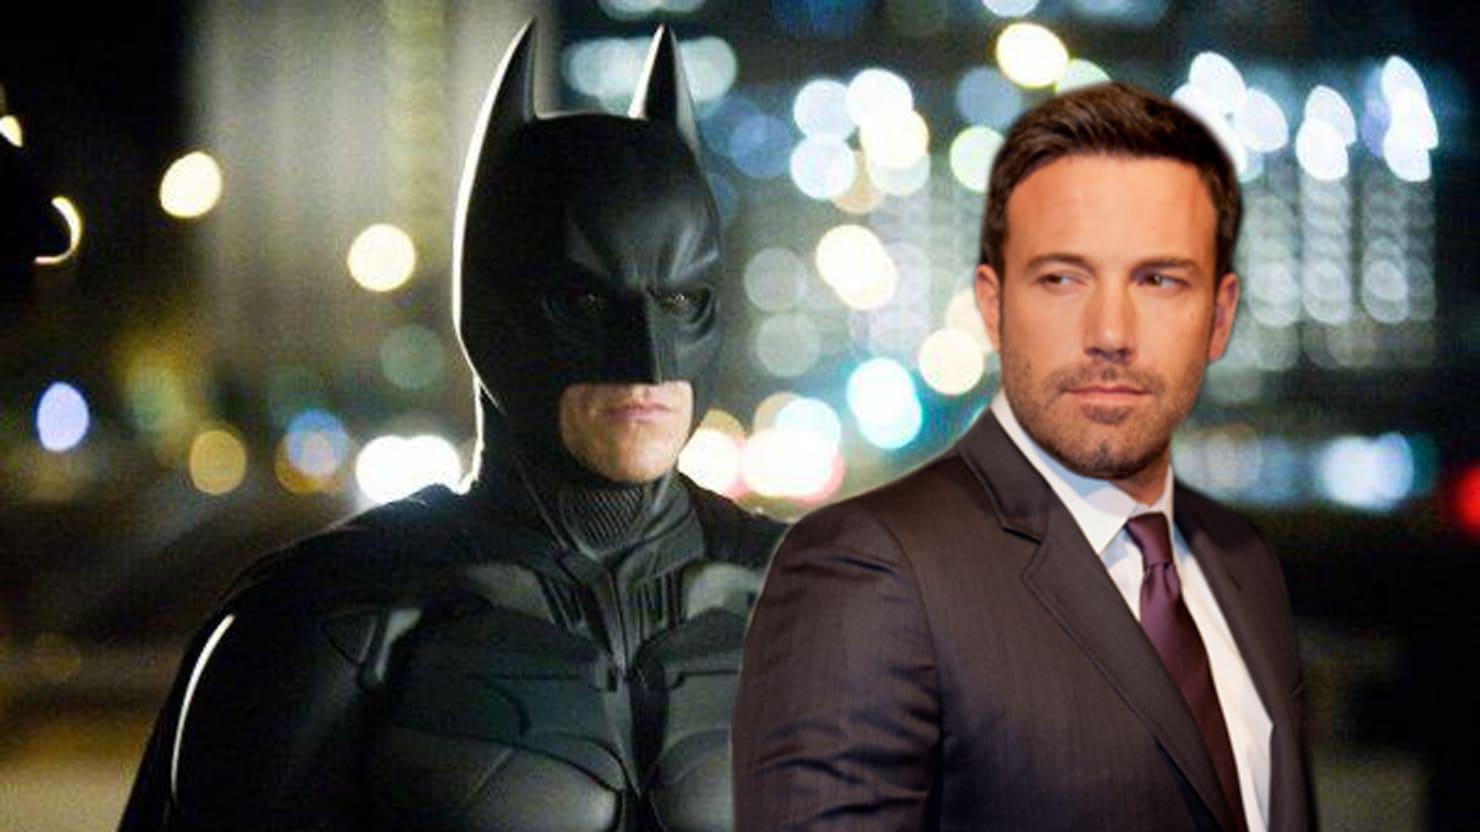 Ben Affleck Isn't the Worst Thing to Happen to Batman